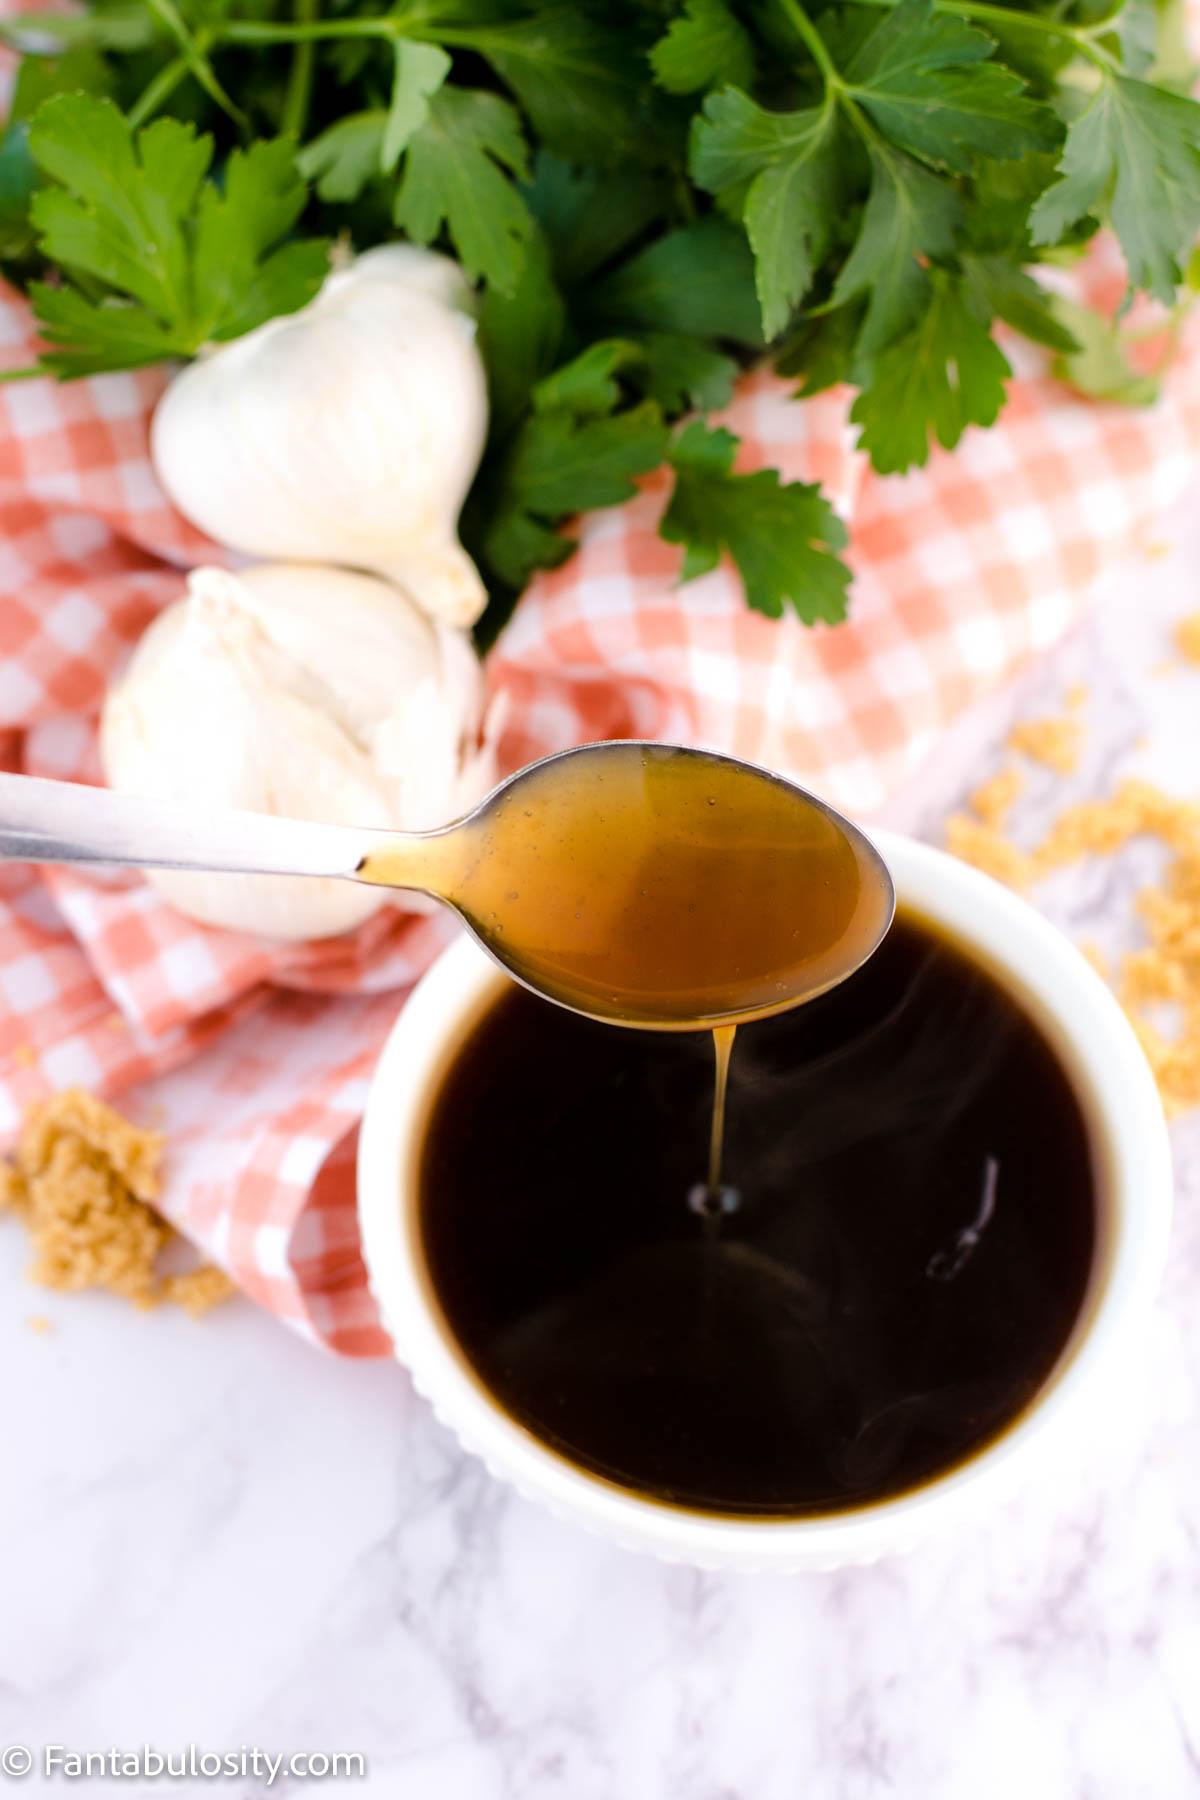 Homemade Teriyaki Sauce Recipe - spoon dripping sauce